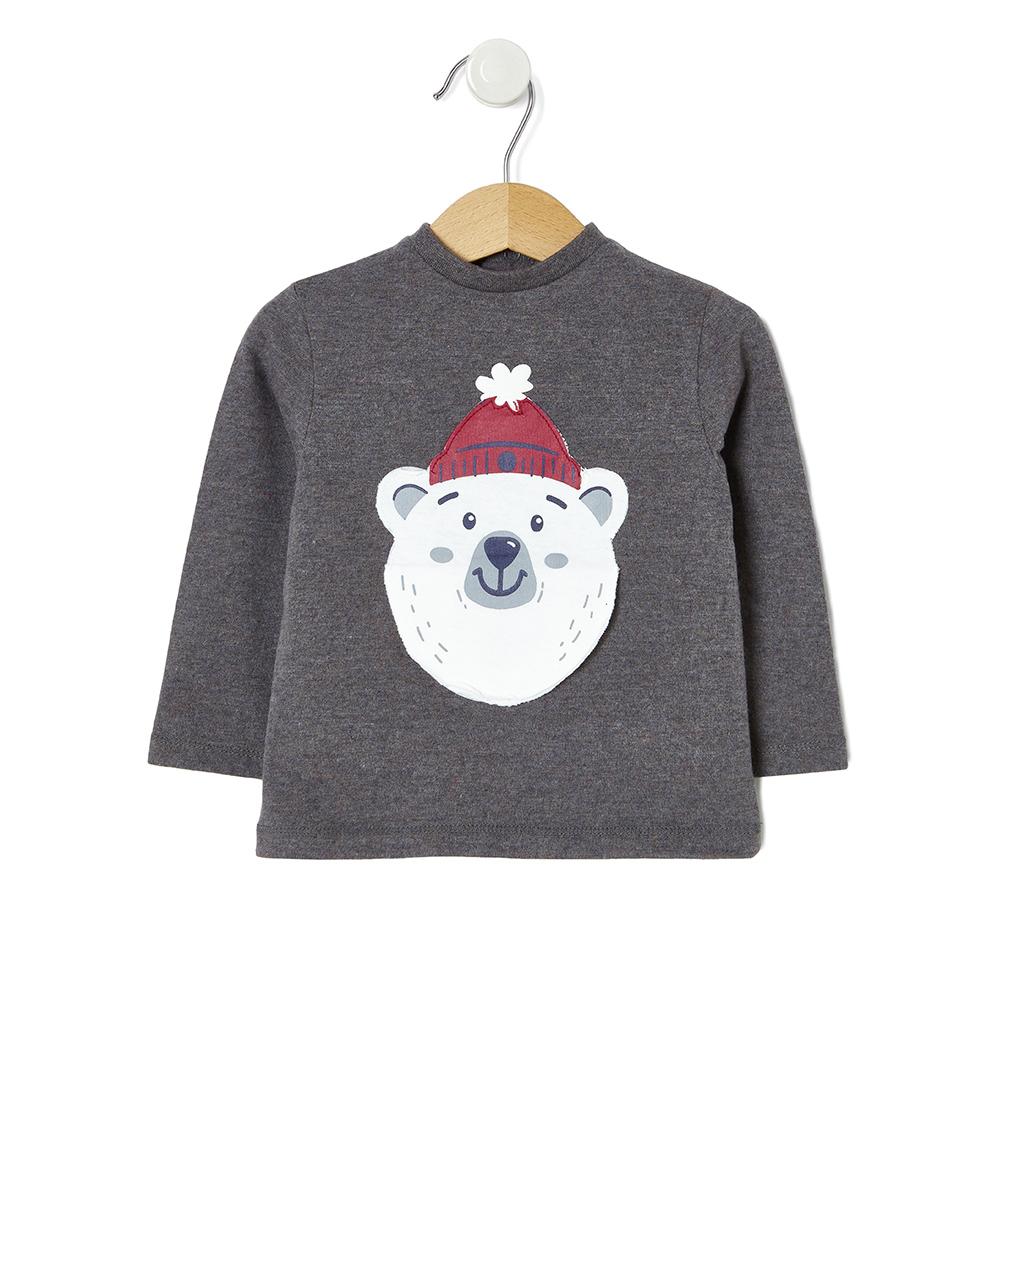 T-shirt con orso animato - Prénatal